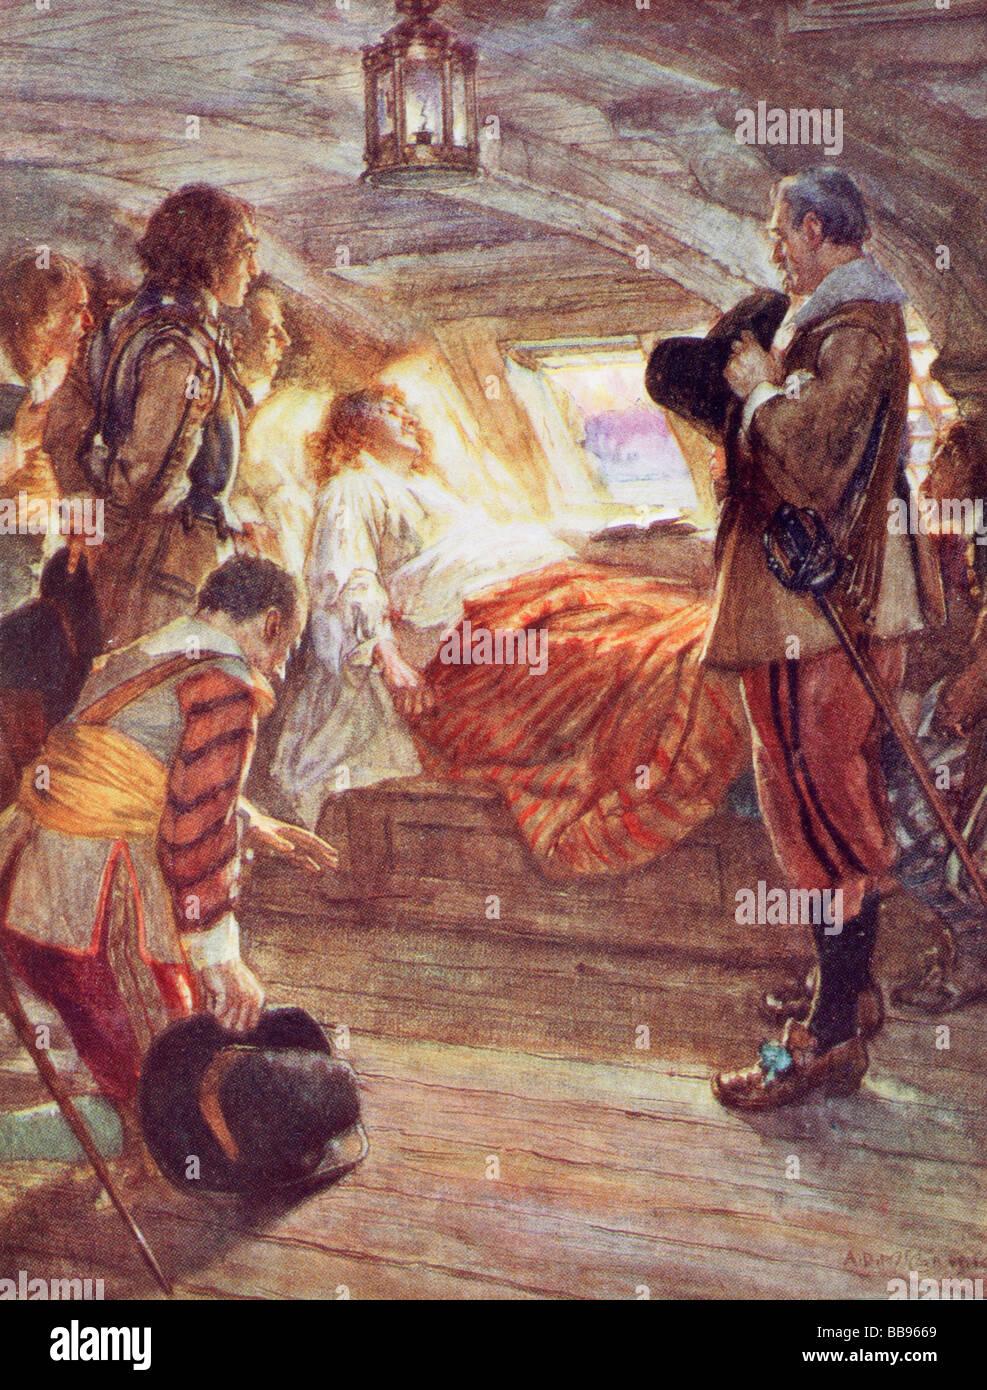 La muerte del Almirante Blake. Después de una pintura de A. D. McCormick . El almirante Robert Blake 1599 al Imagen De Stock